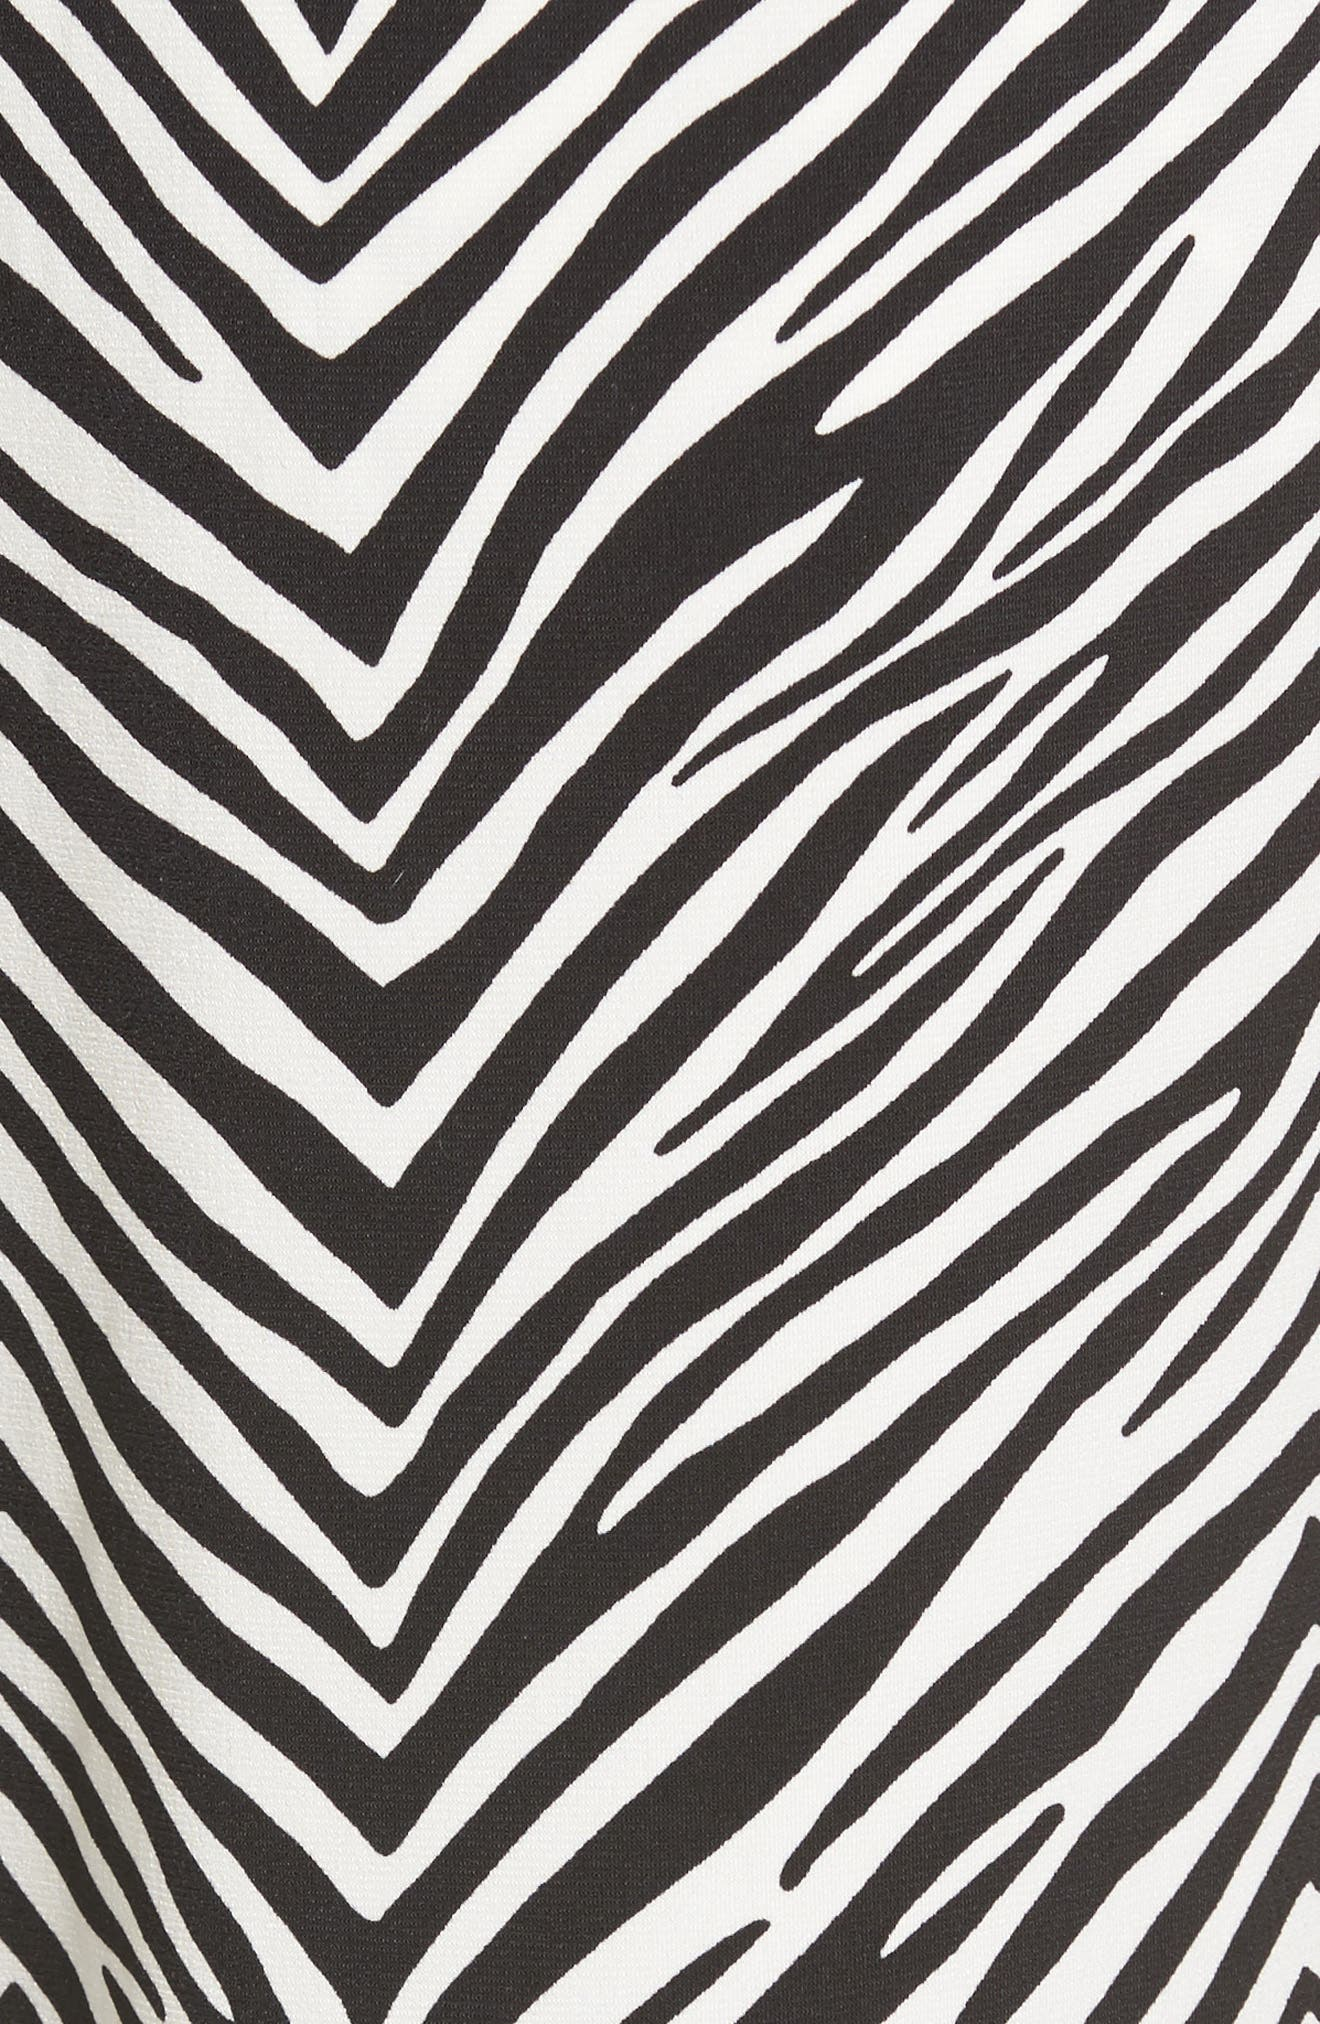 Zebra Print Drawstring Waist Pants,                             Alternate thumbnail 5, color,                             010